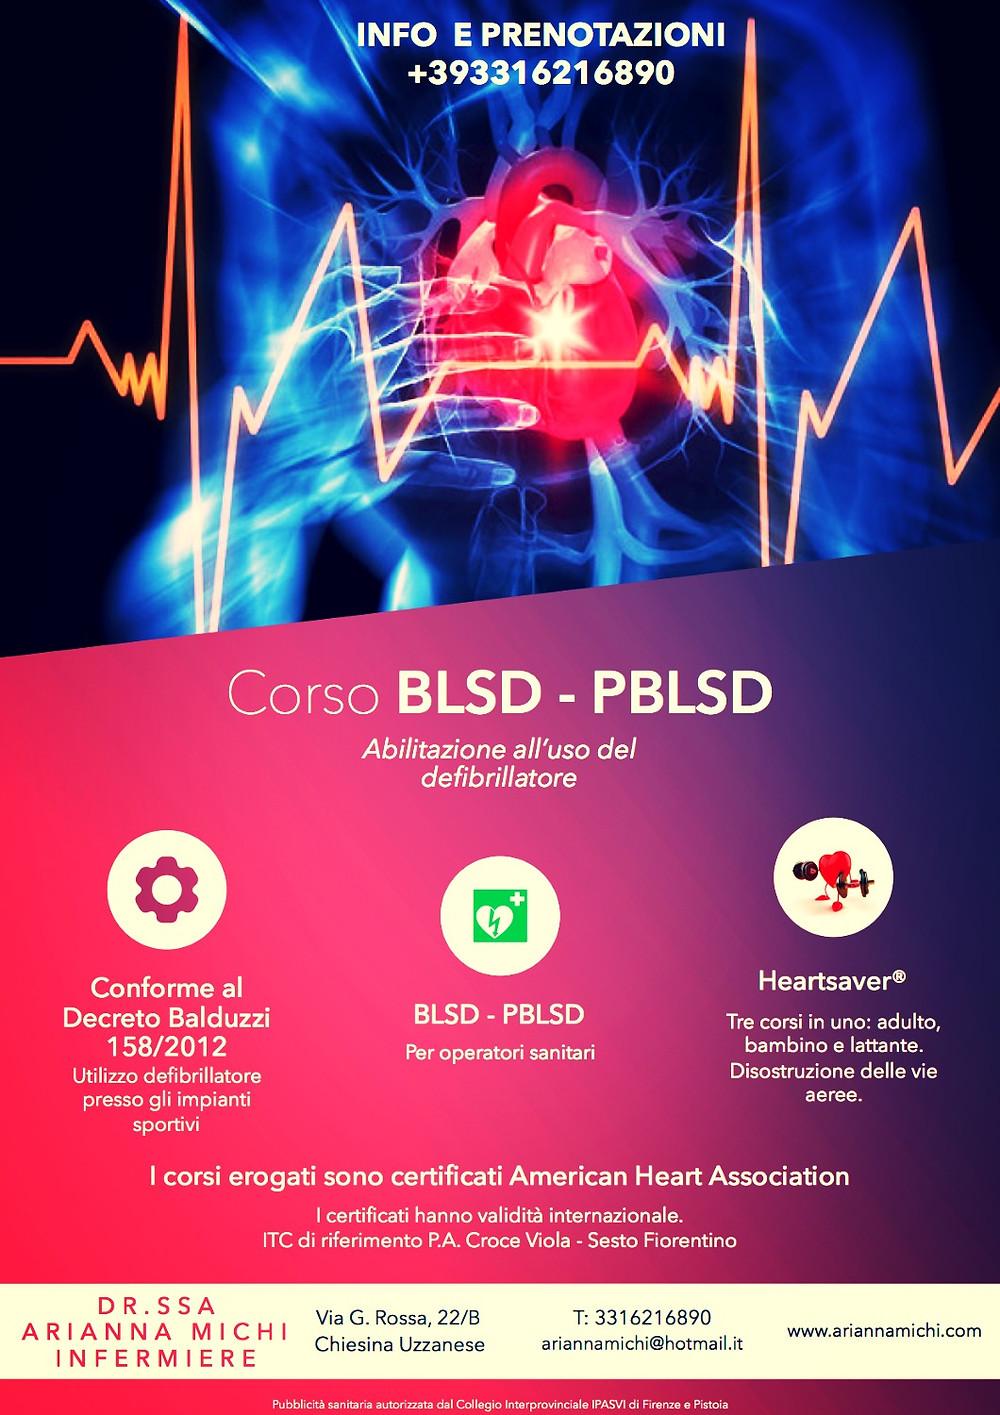 BLSD - American Heart Association - 7 Febbraio 2018